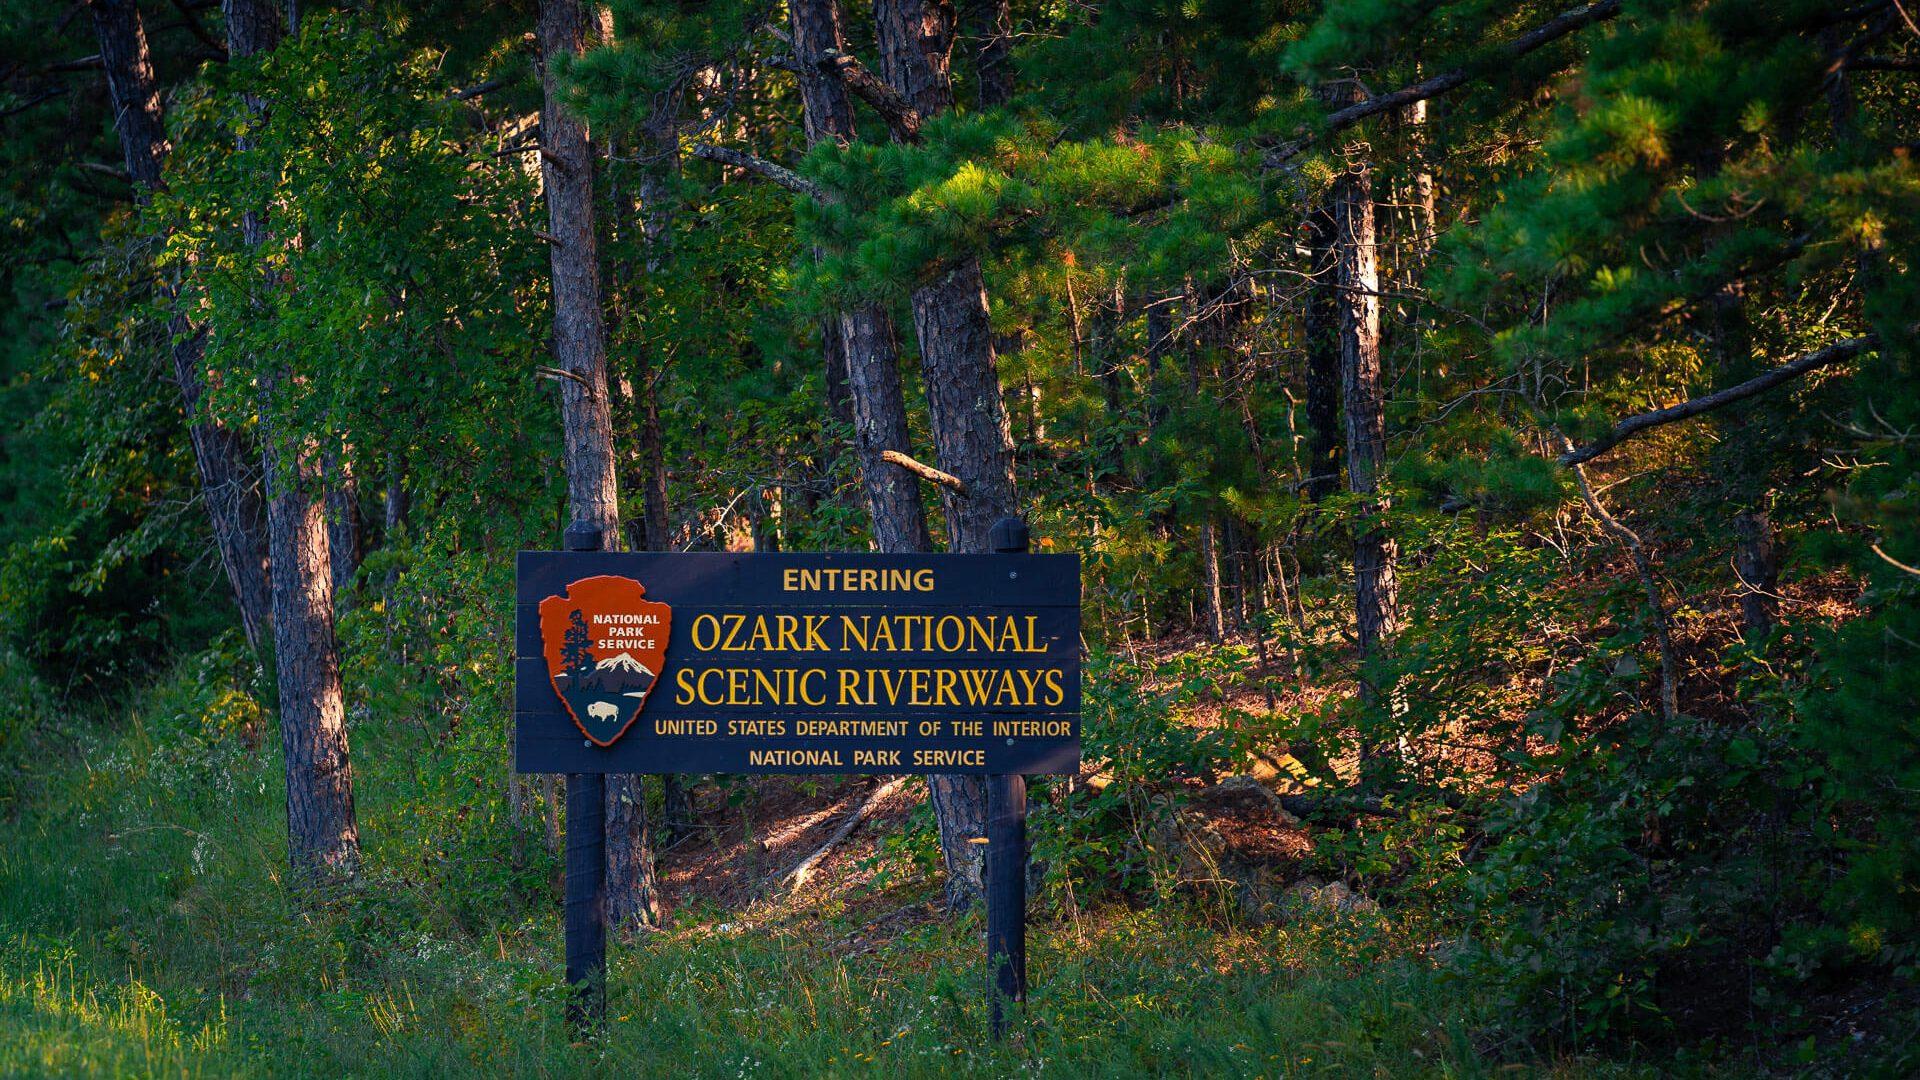 Ozark National Scenic Riverways preserves a wild river system